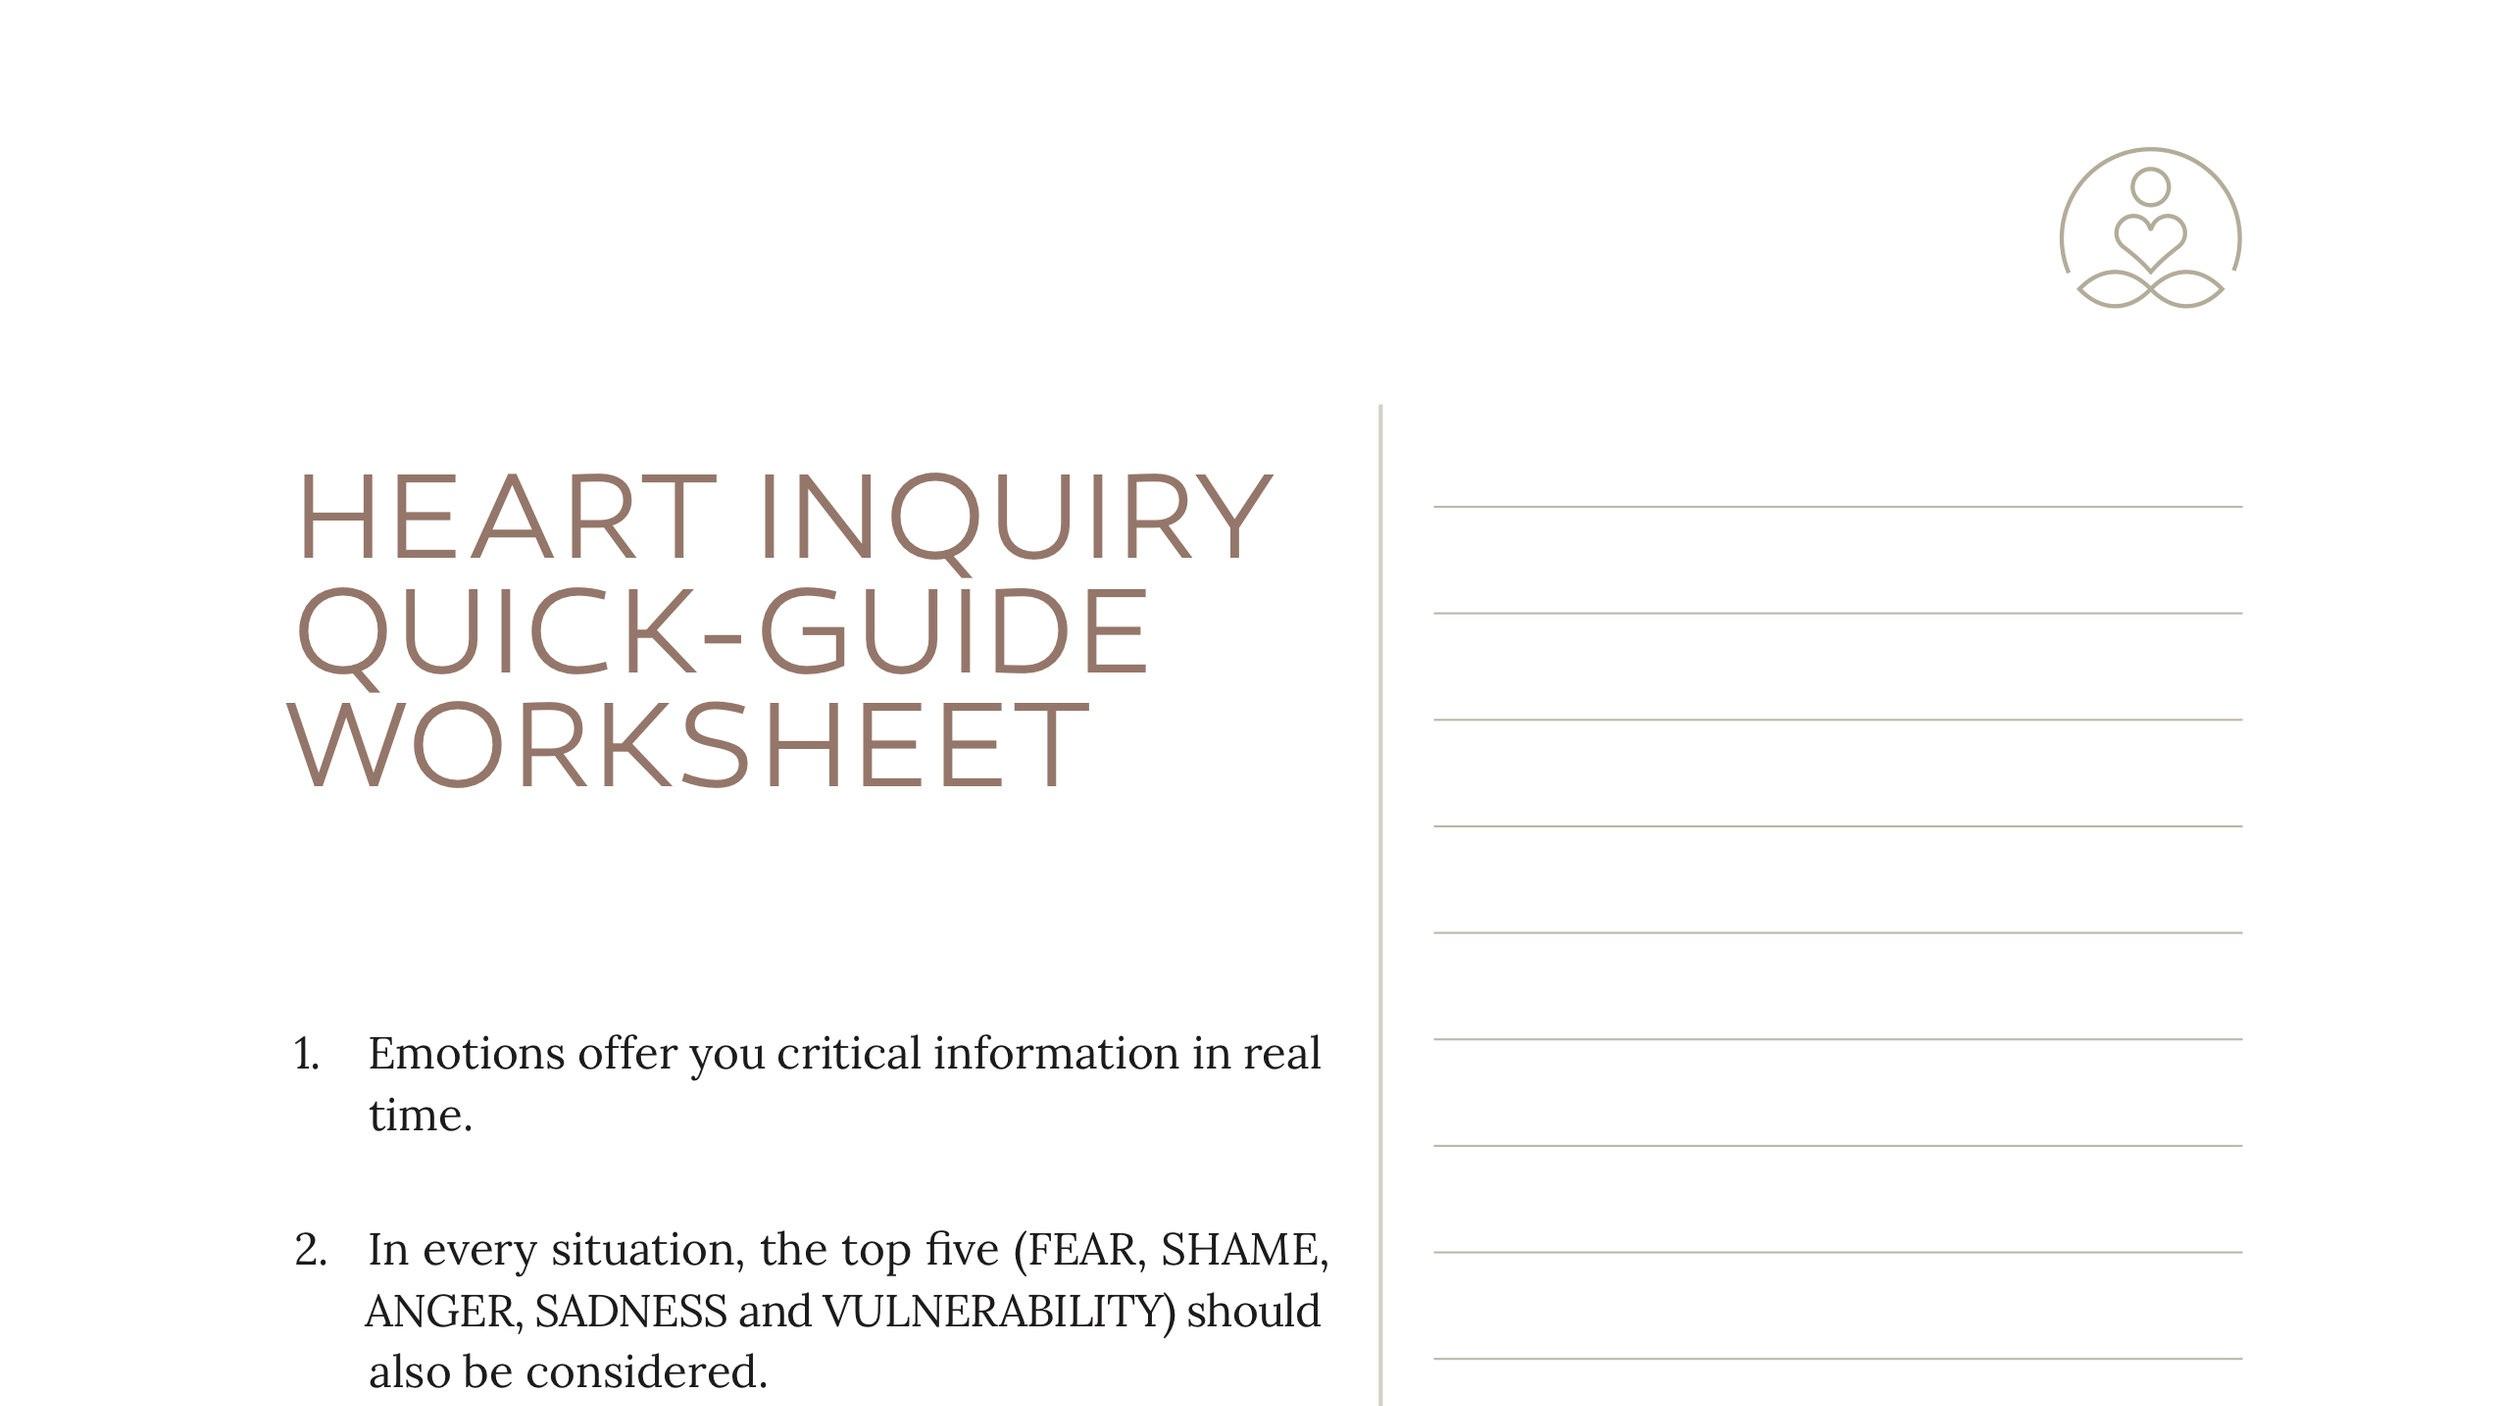 Heart+Inquiry+Quick+Guide+Worksheet.jpg